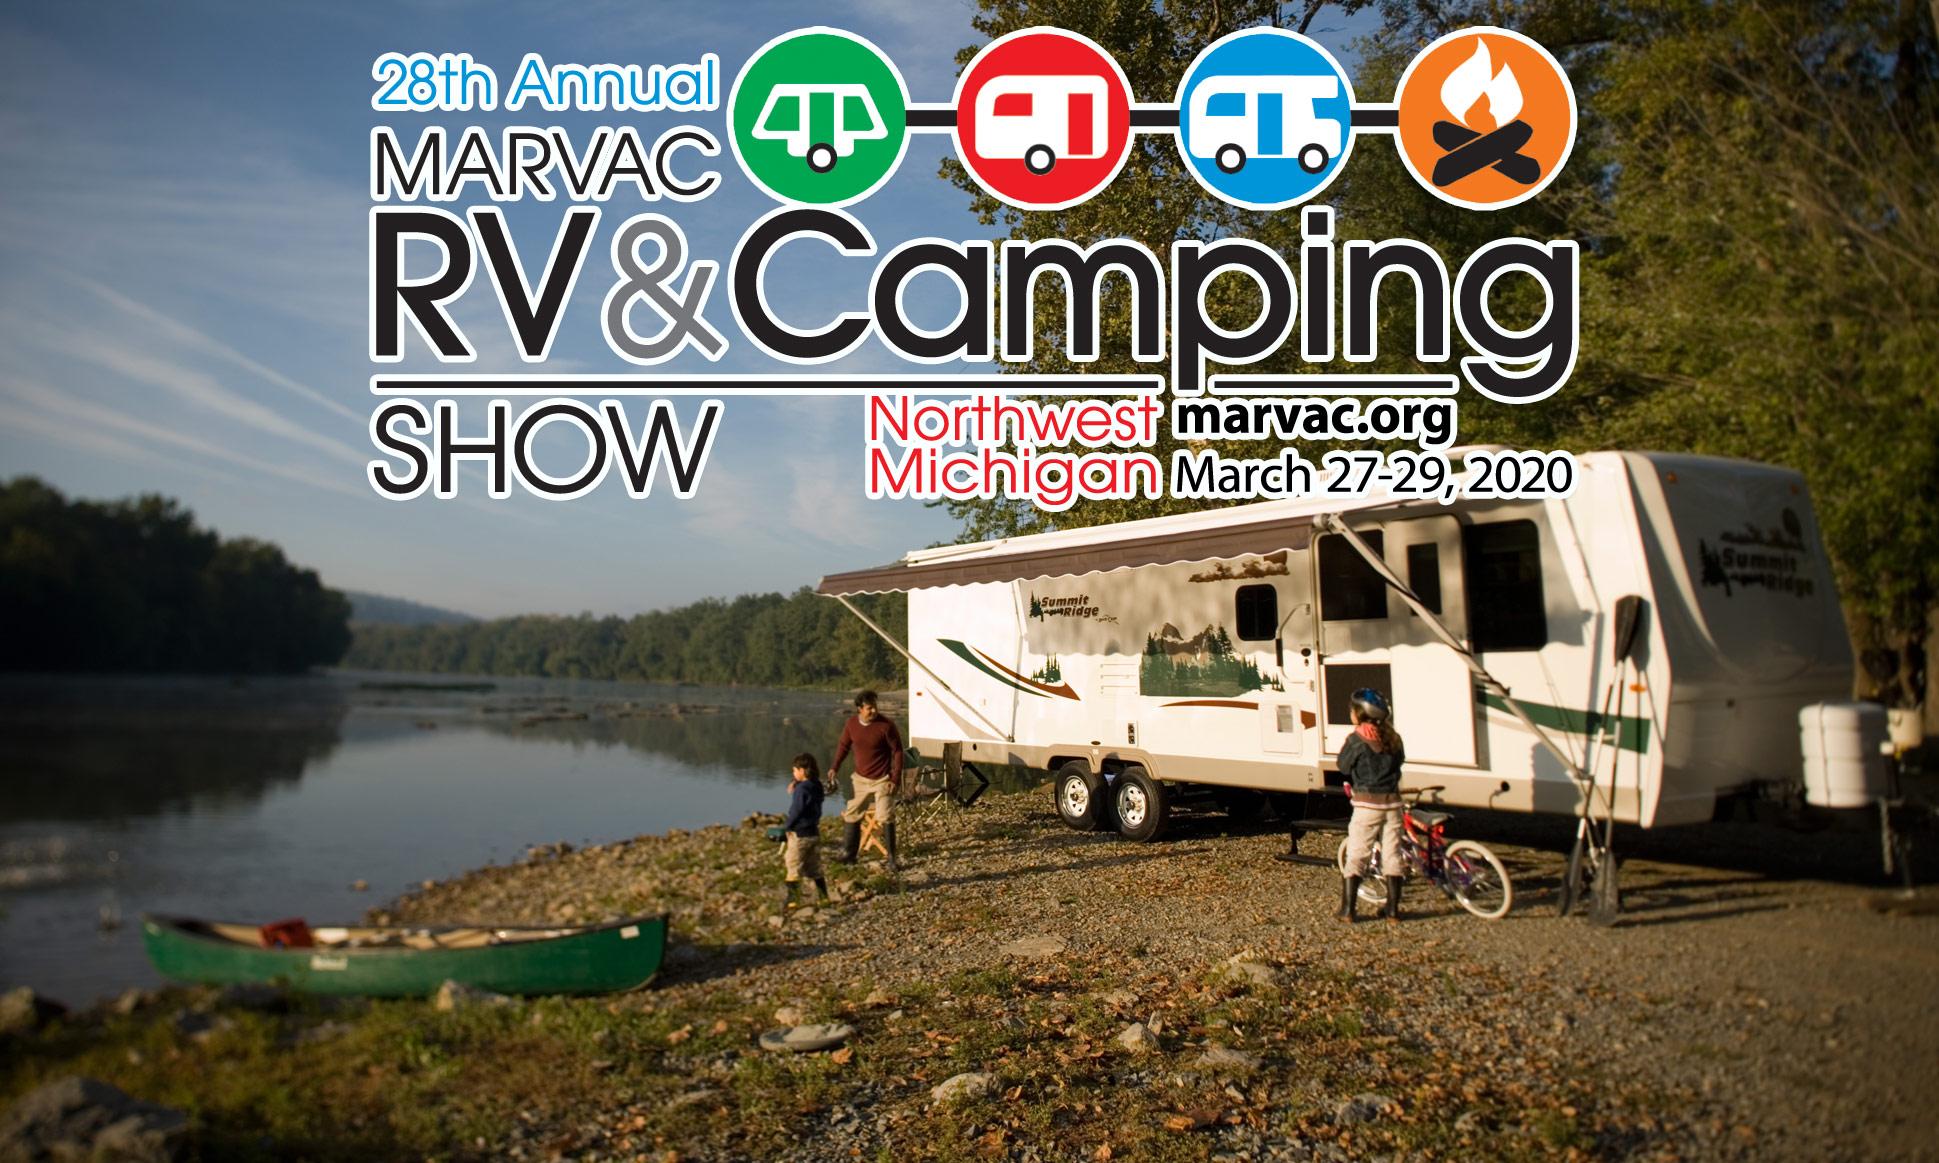 Events Calendar February 2020 Flint Mi 28th Annual Northwest Michigan RV & Camping Show March 27 29, 2020